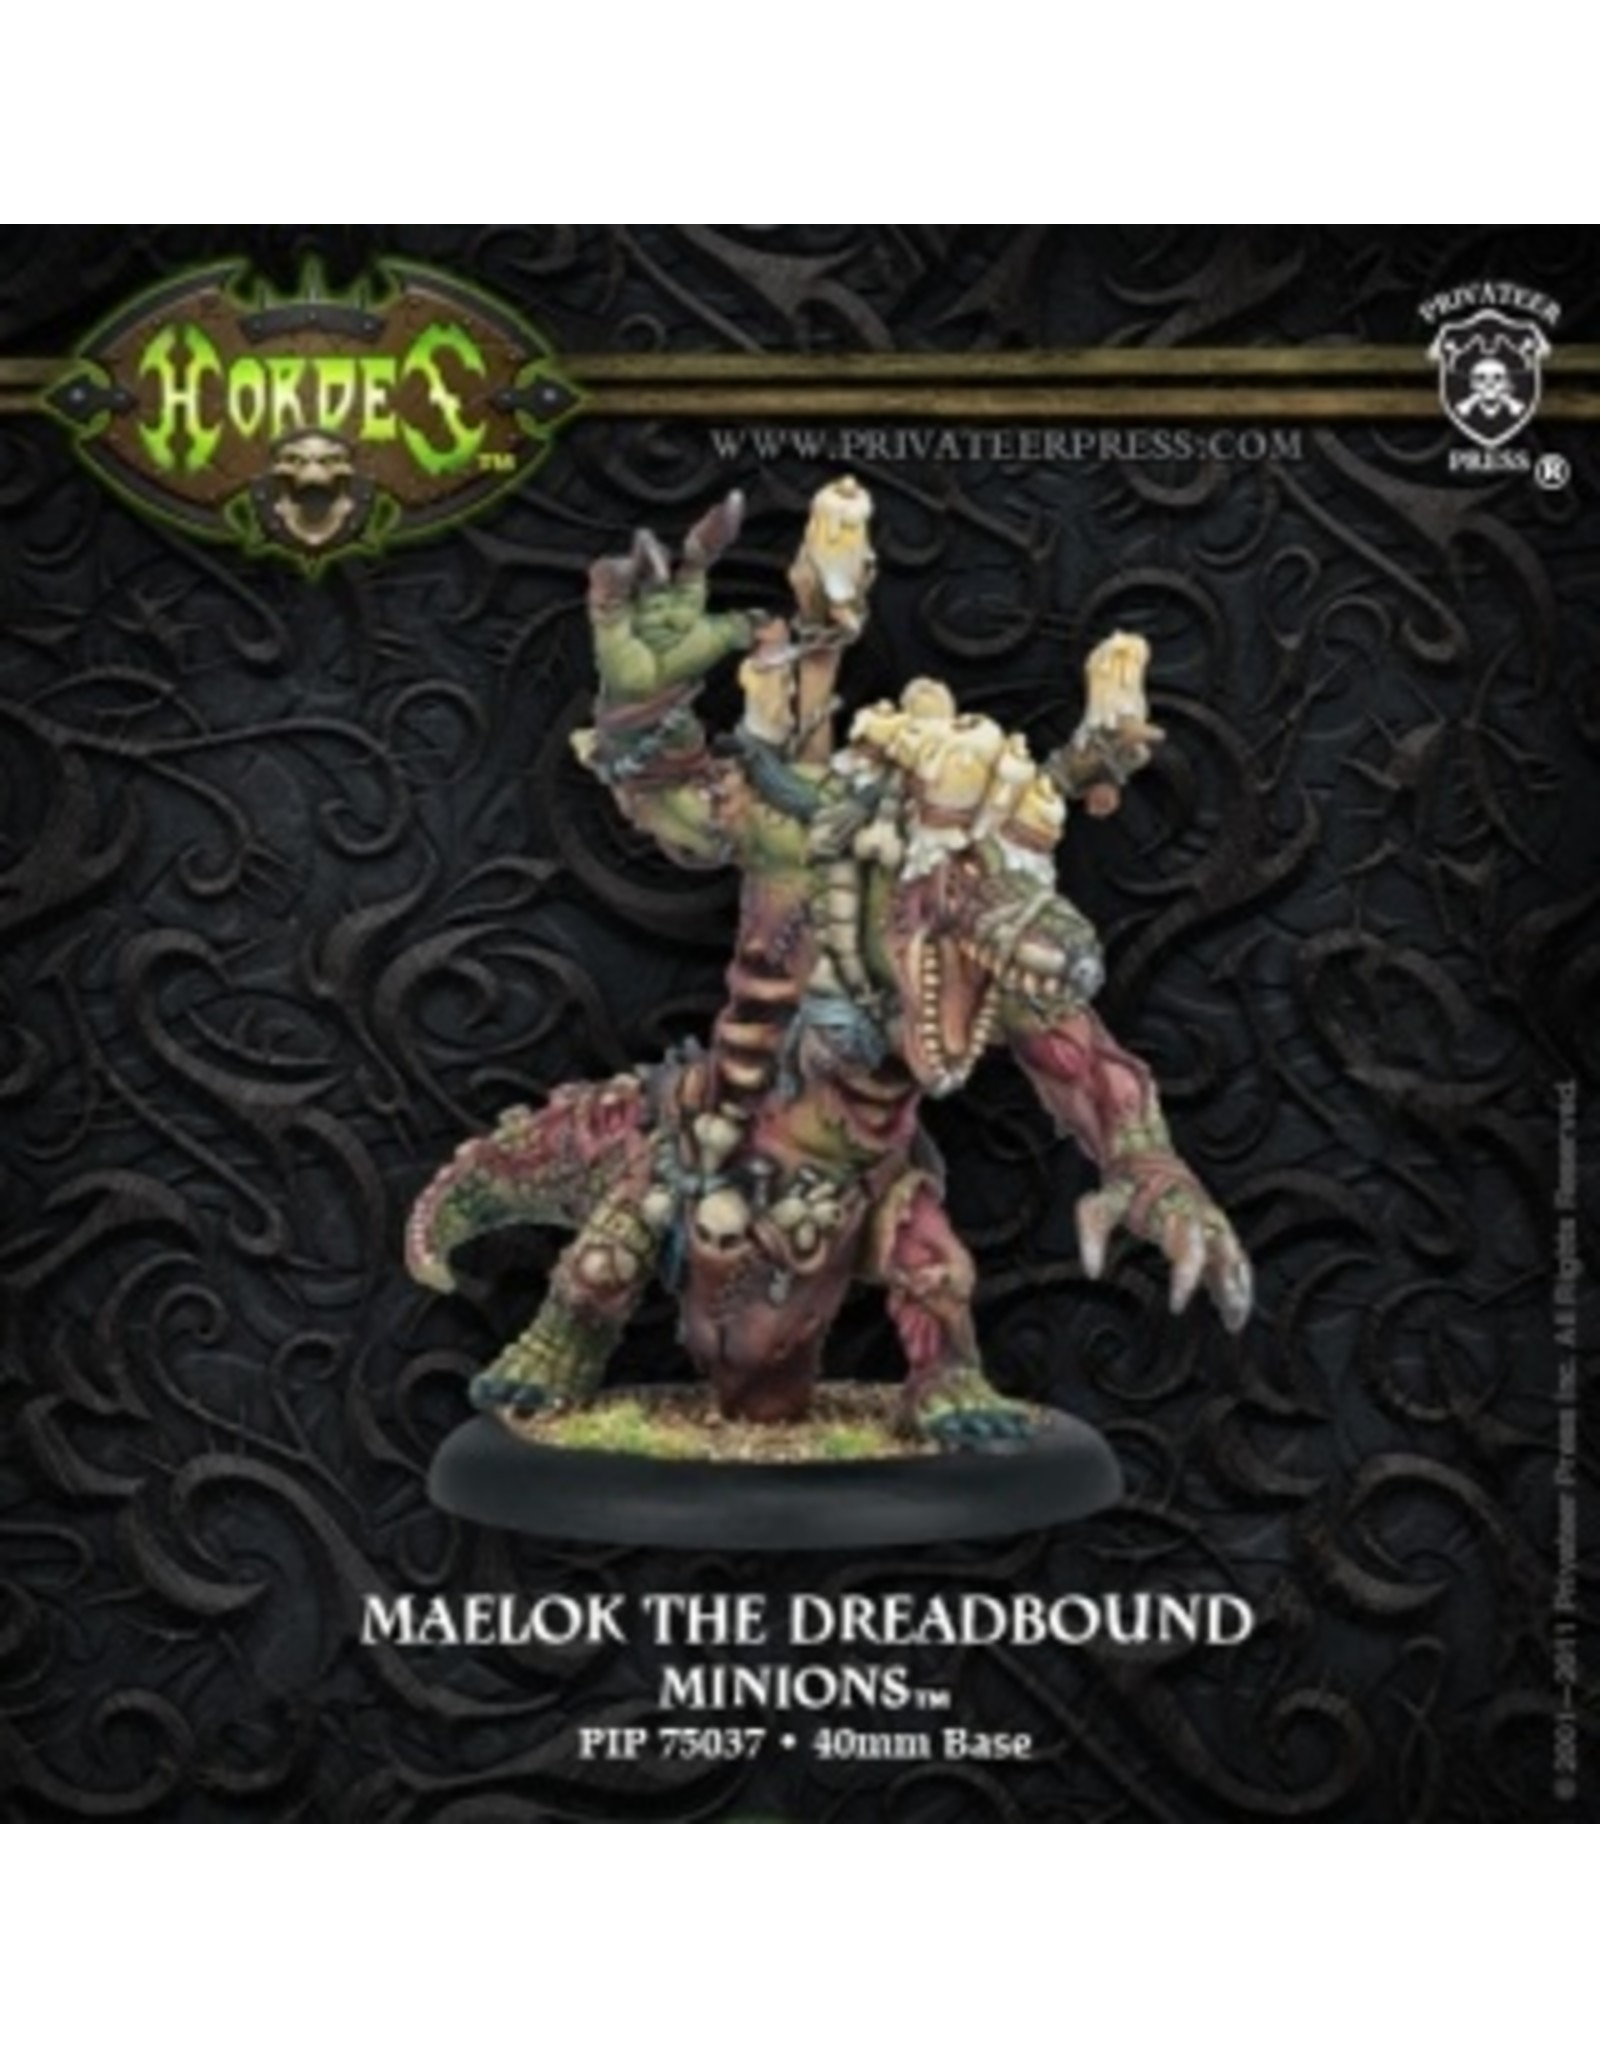 Hordes: Minions Maelok the Dreadbound Gatorman Warlock (White Metal)